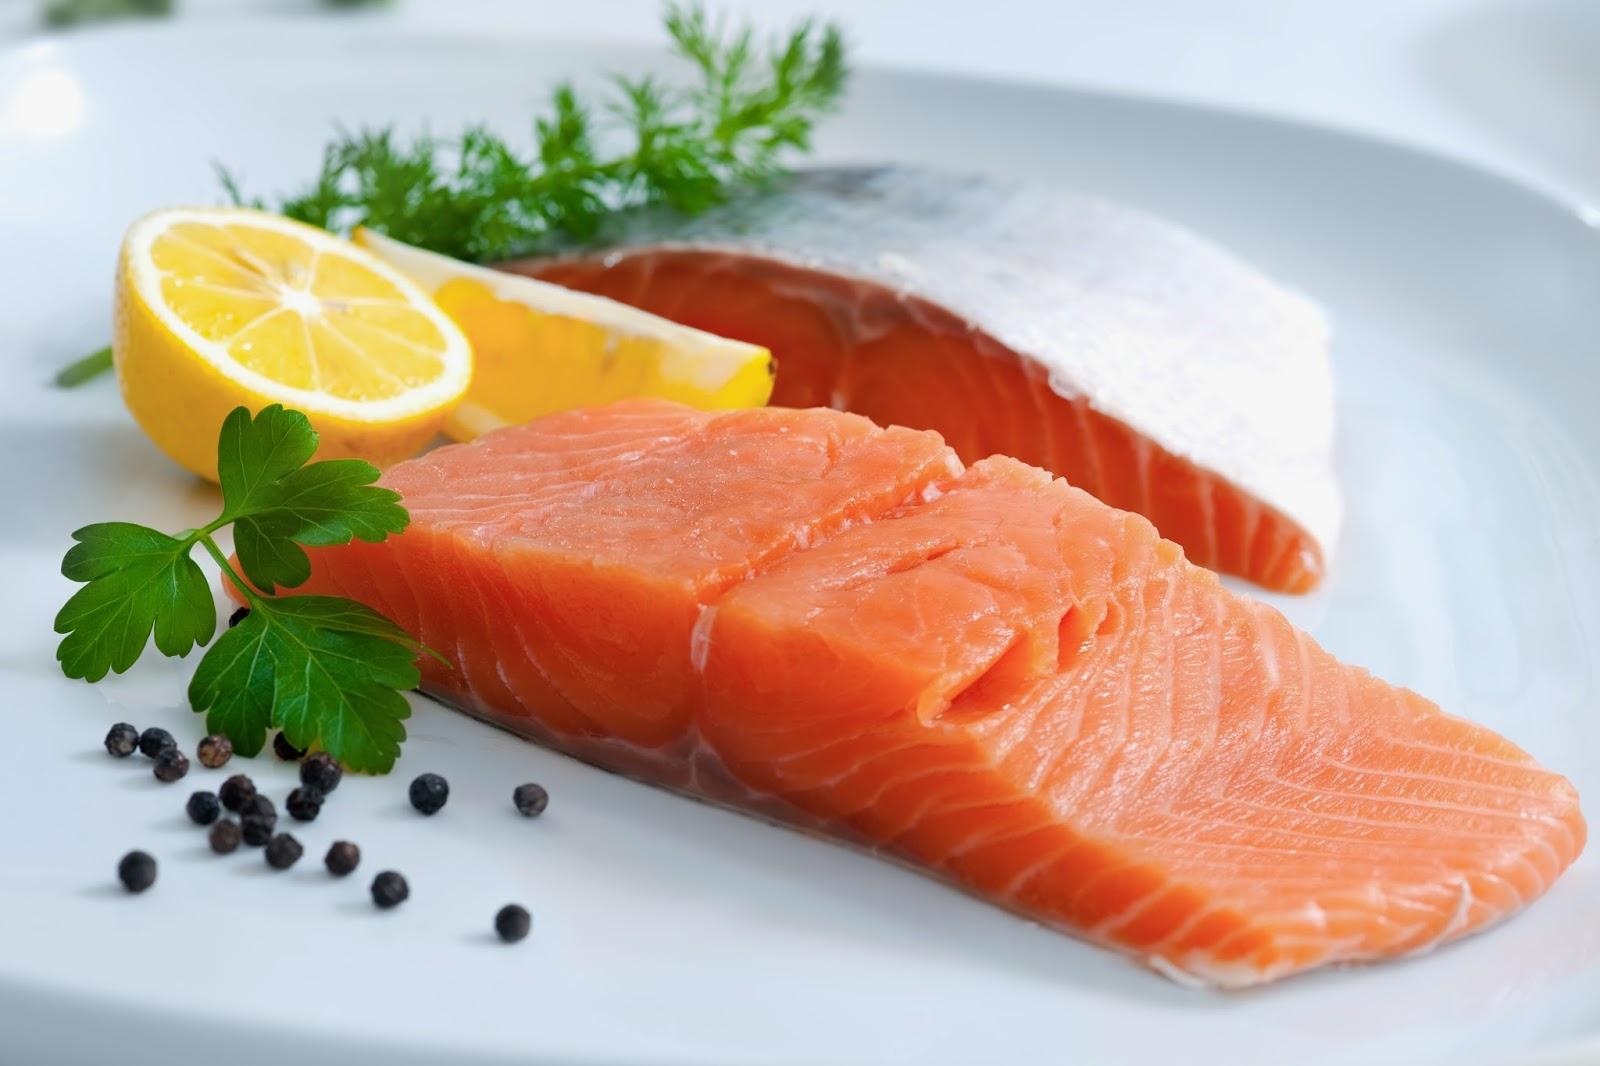 turun kolesterol, phytocol-st, oemega guard, garlic, kolesterol, fitosterol, tips, makanan, salomon